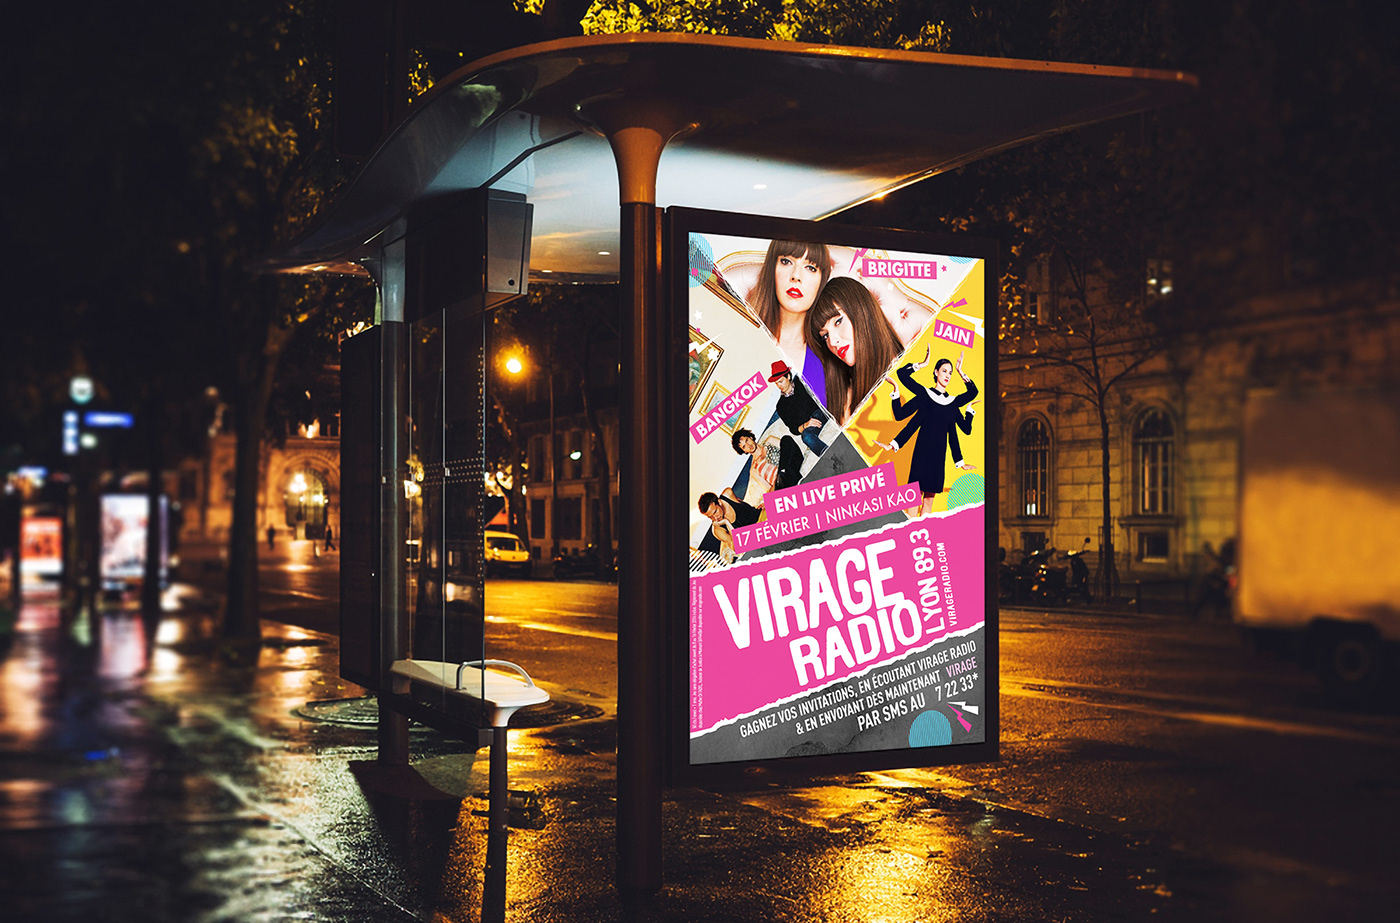 concert live poster music Bangkok band showcase Radio brigitte jain